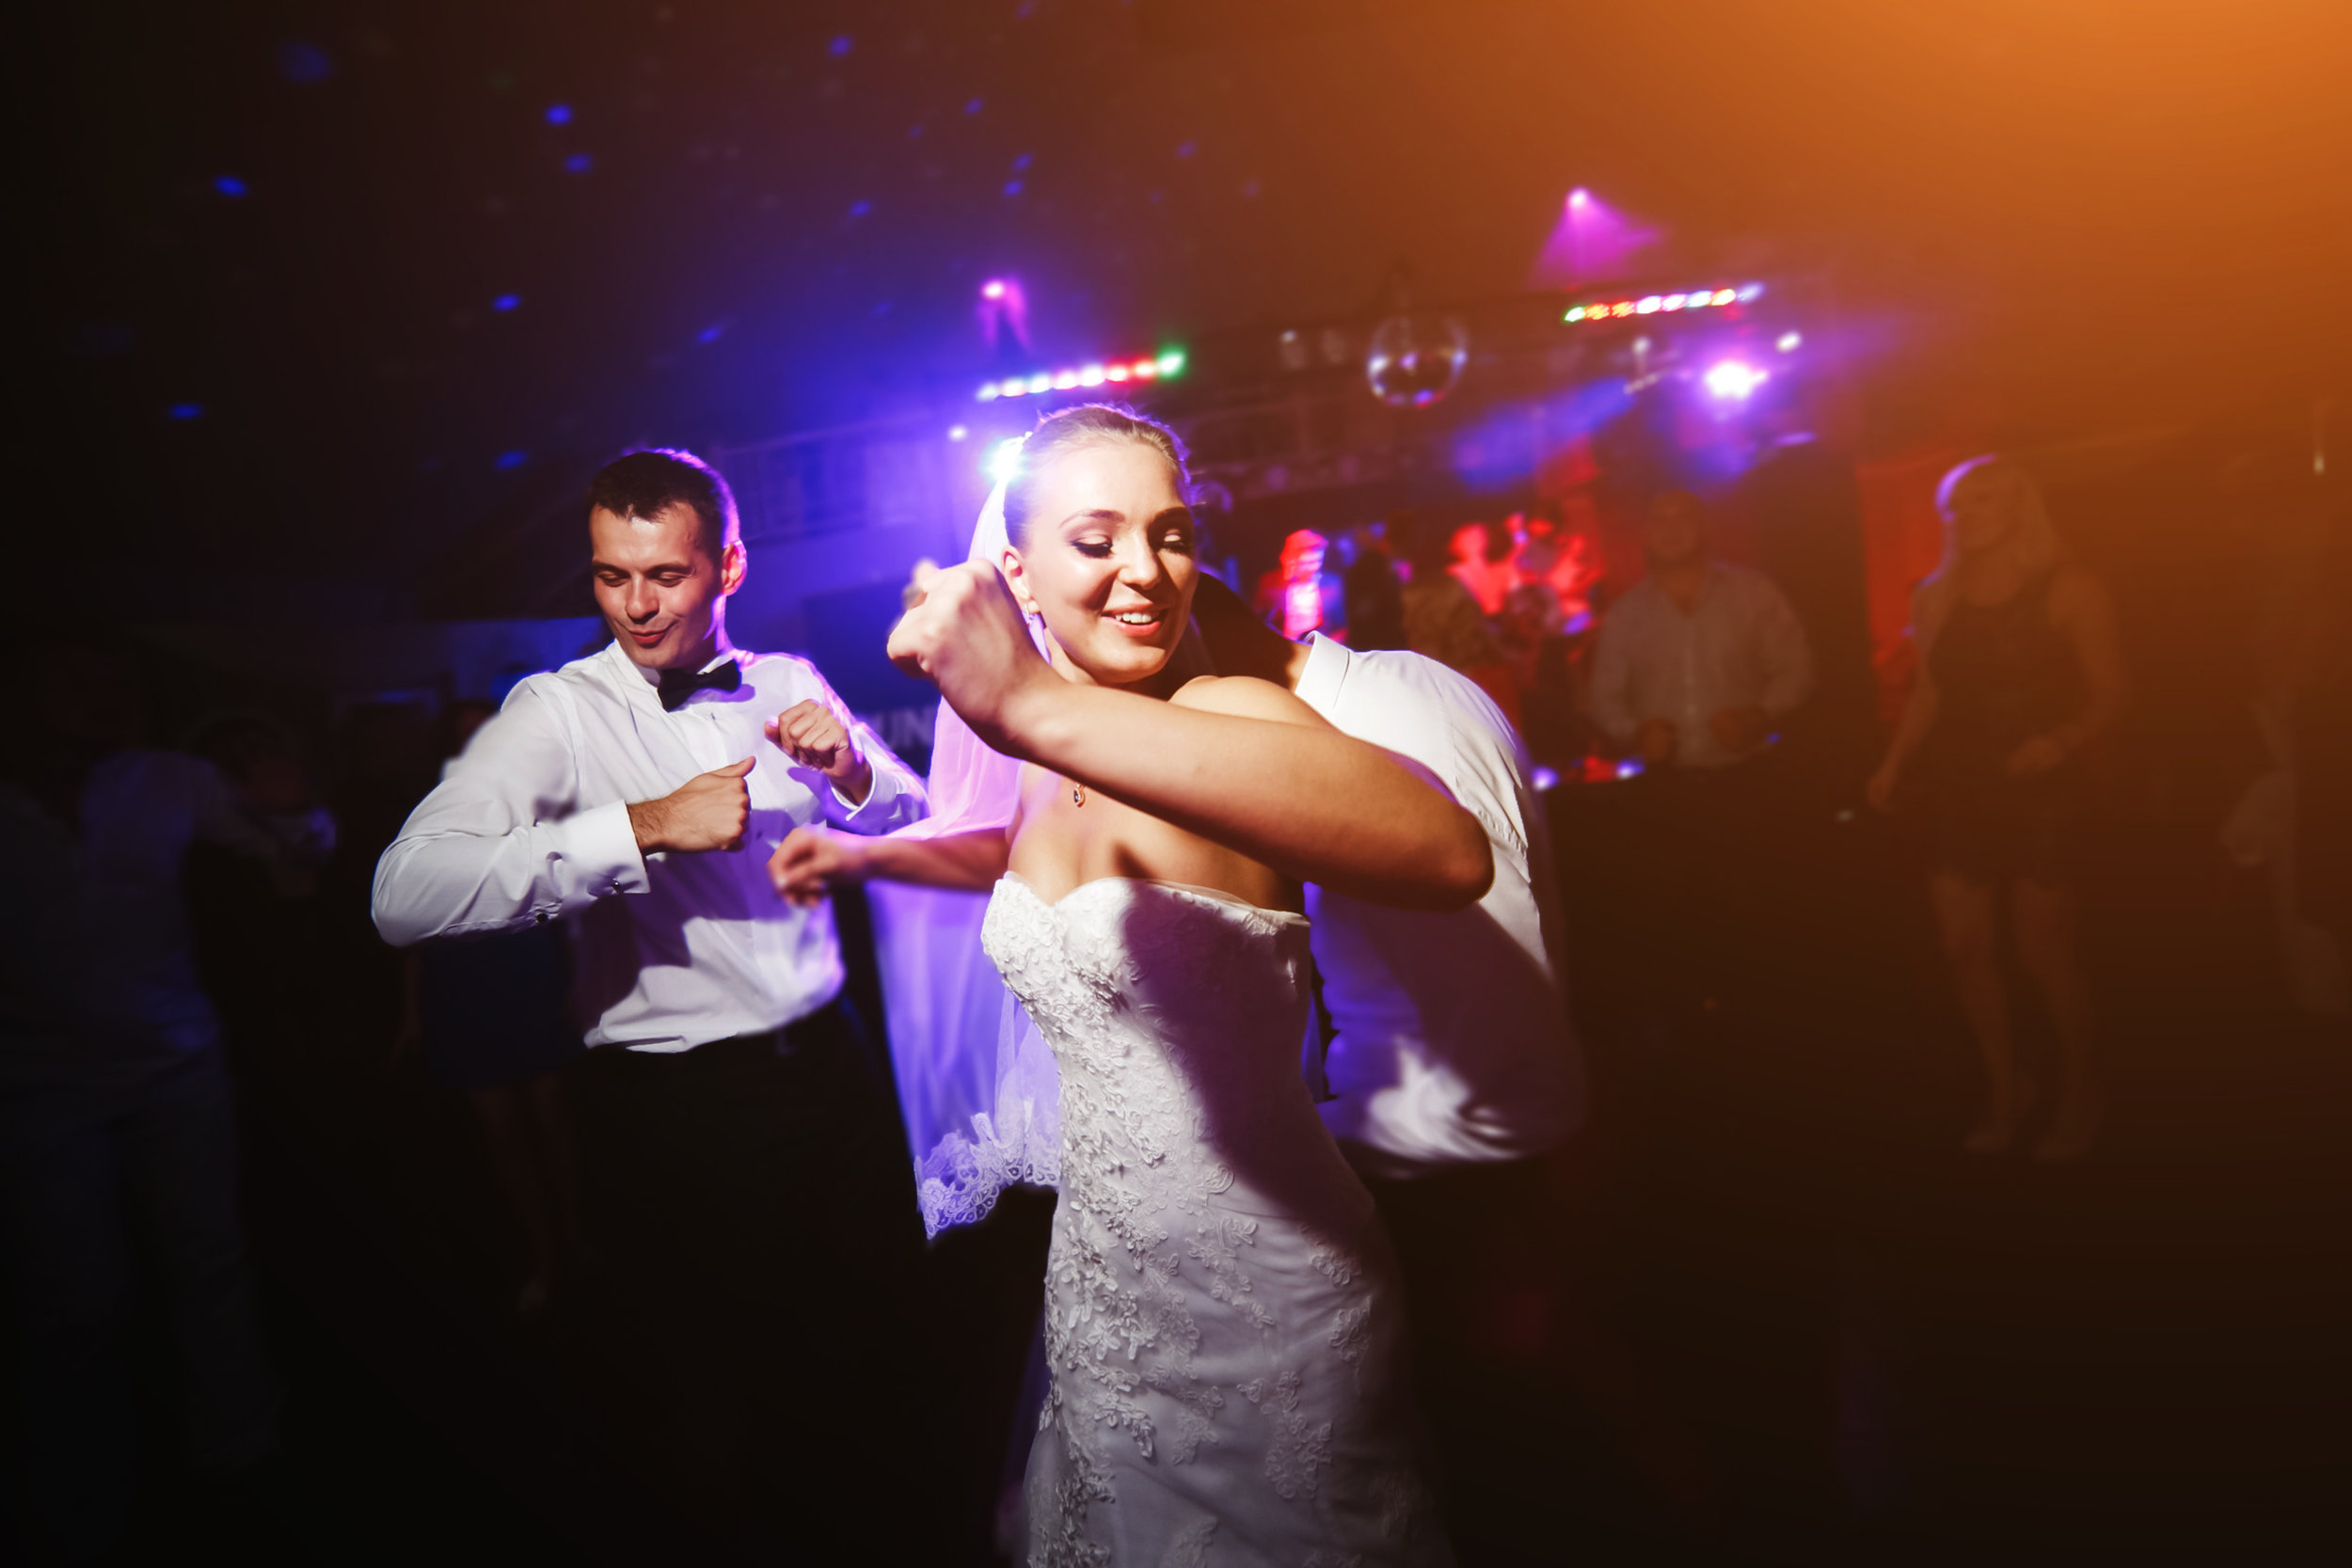 Top 2016 wedding DJ songs